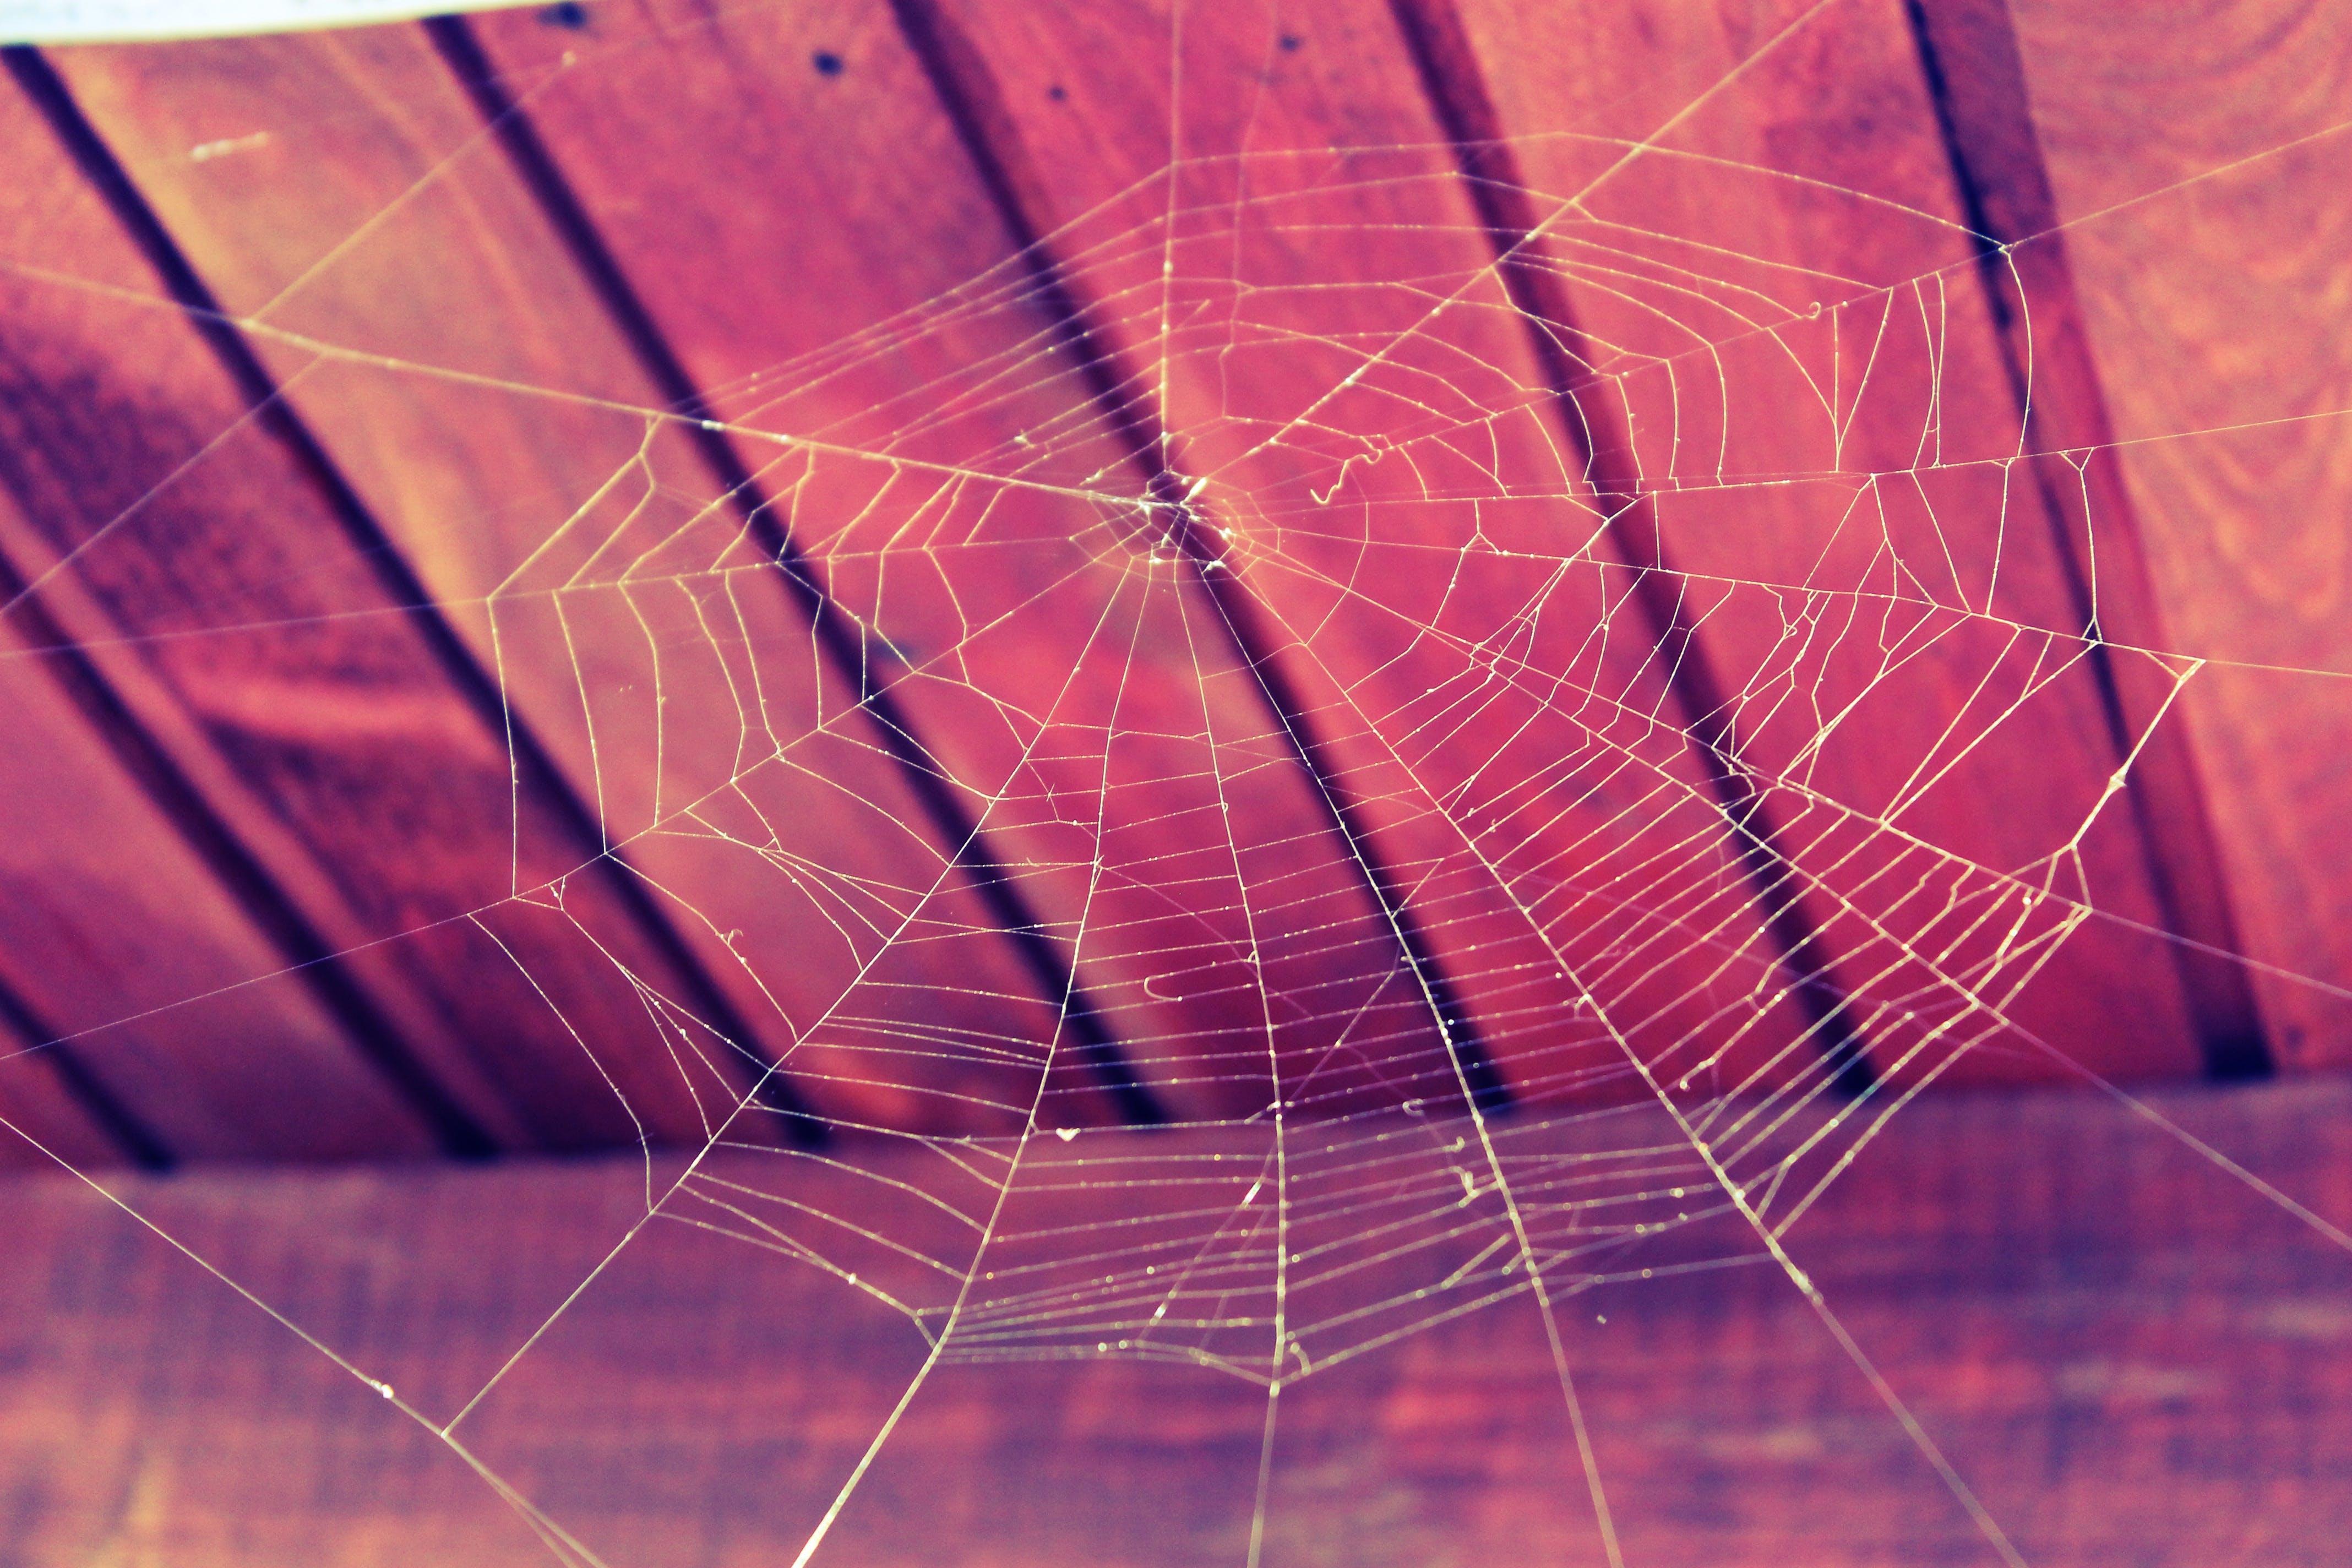 close-up, cobweb, connection